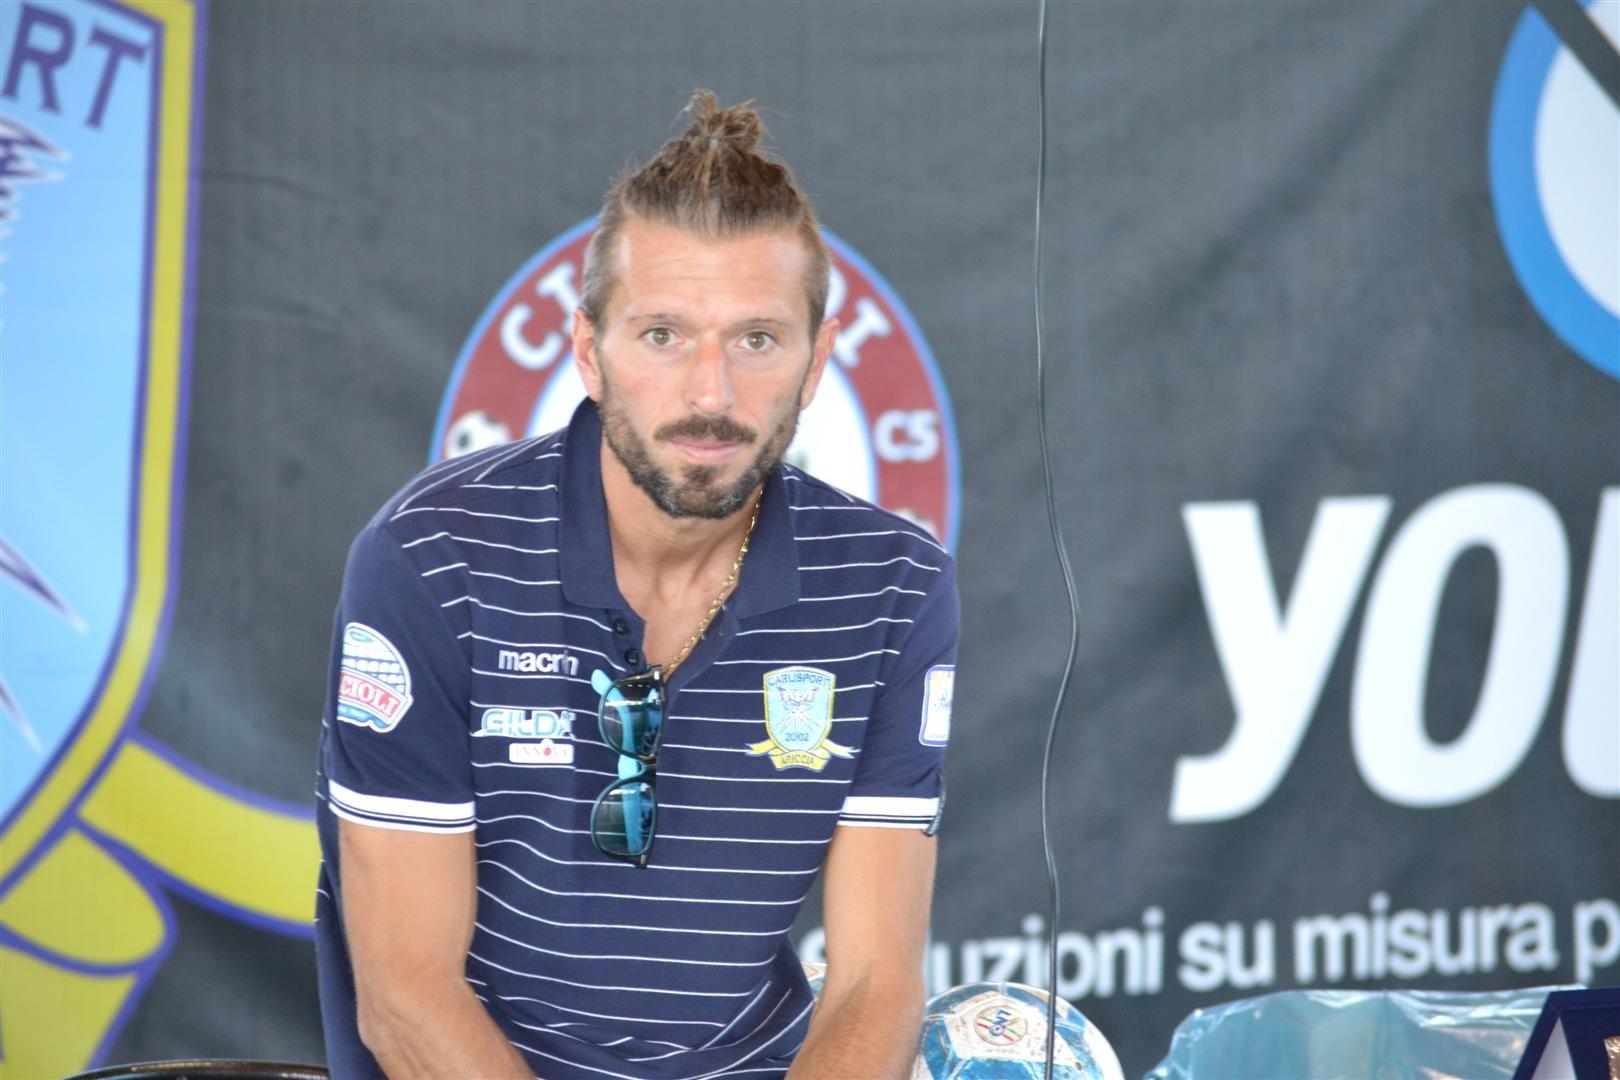 Gianluca Ercolani Carlisport Ariccia